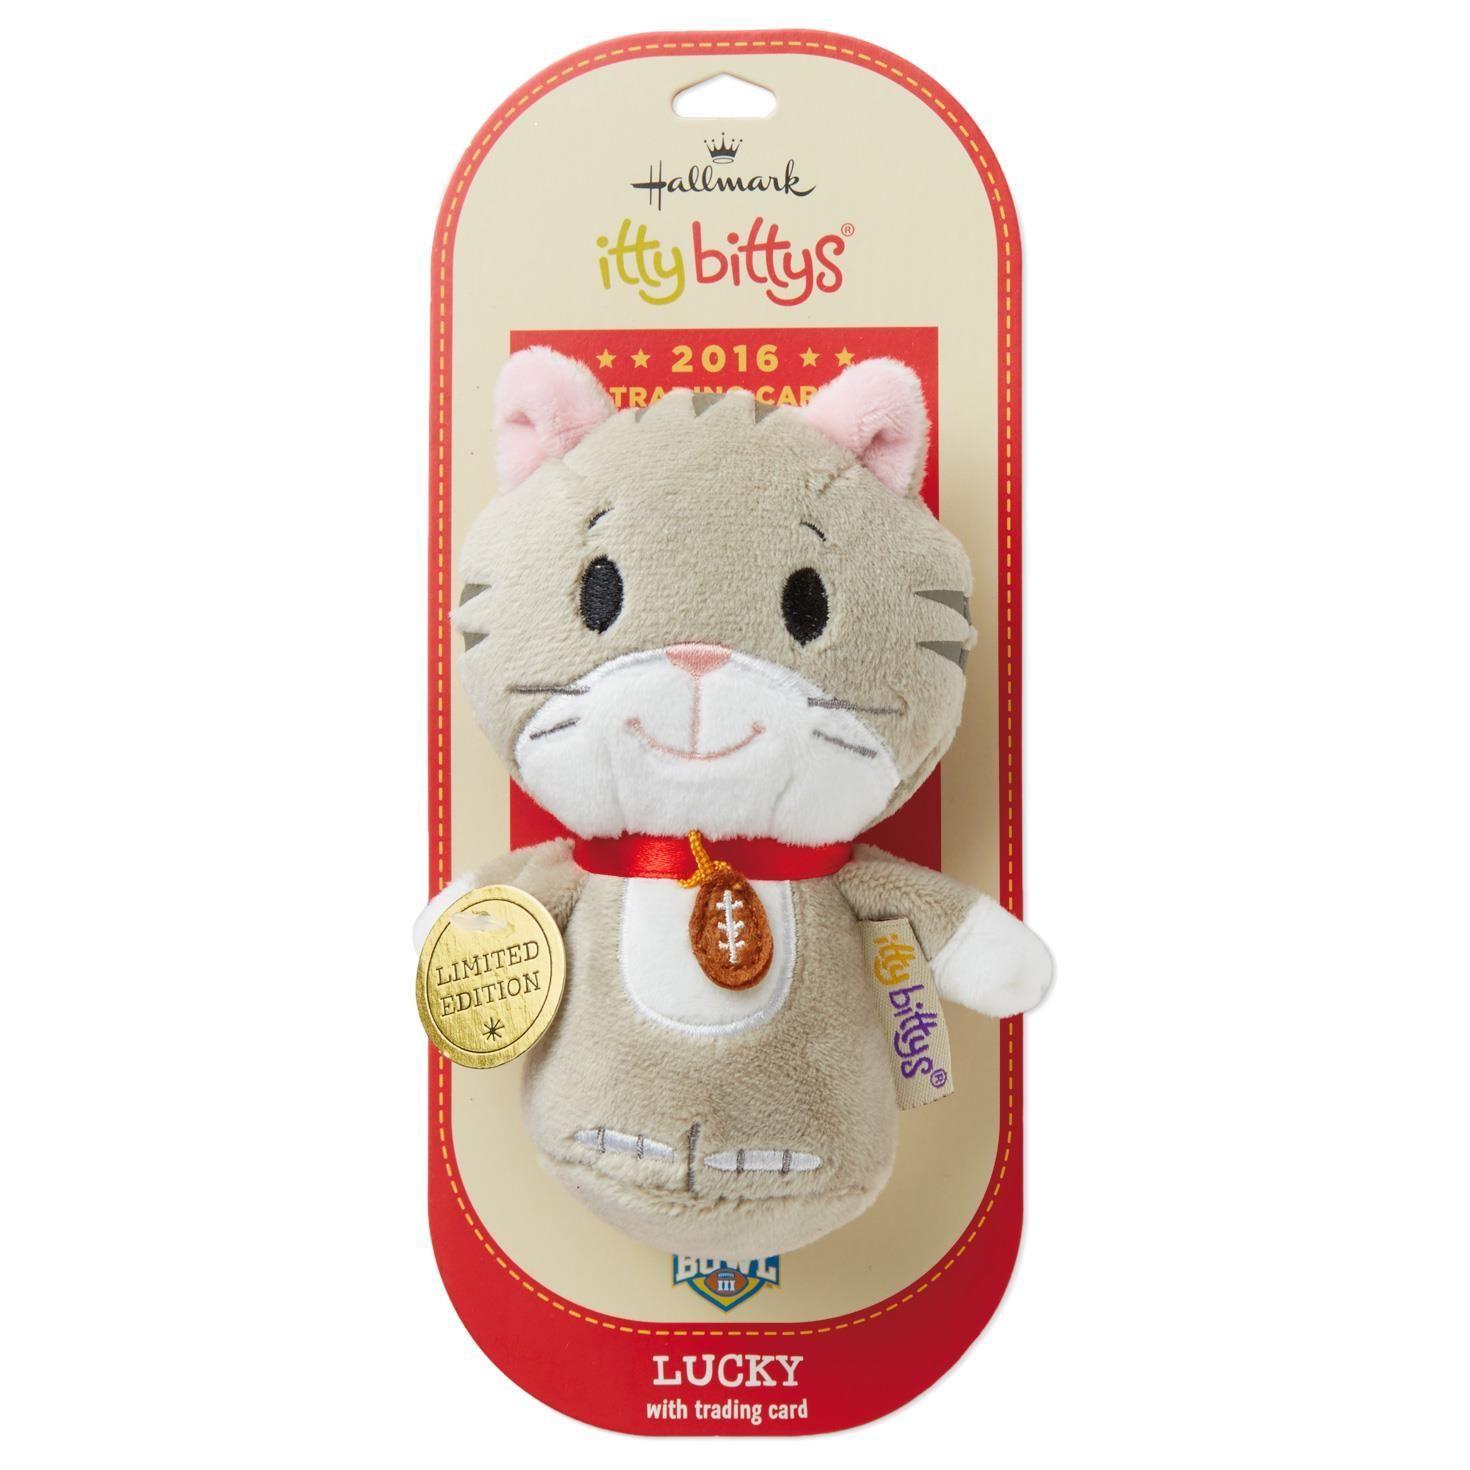 Itty Bittys Kitten Bowl Lucky Stuffed Animal Kitten Bowls Itty Bitty Itty